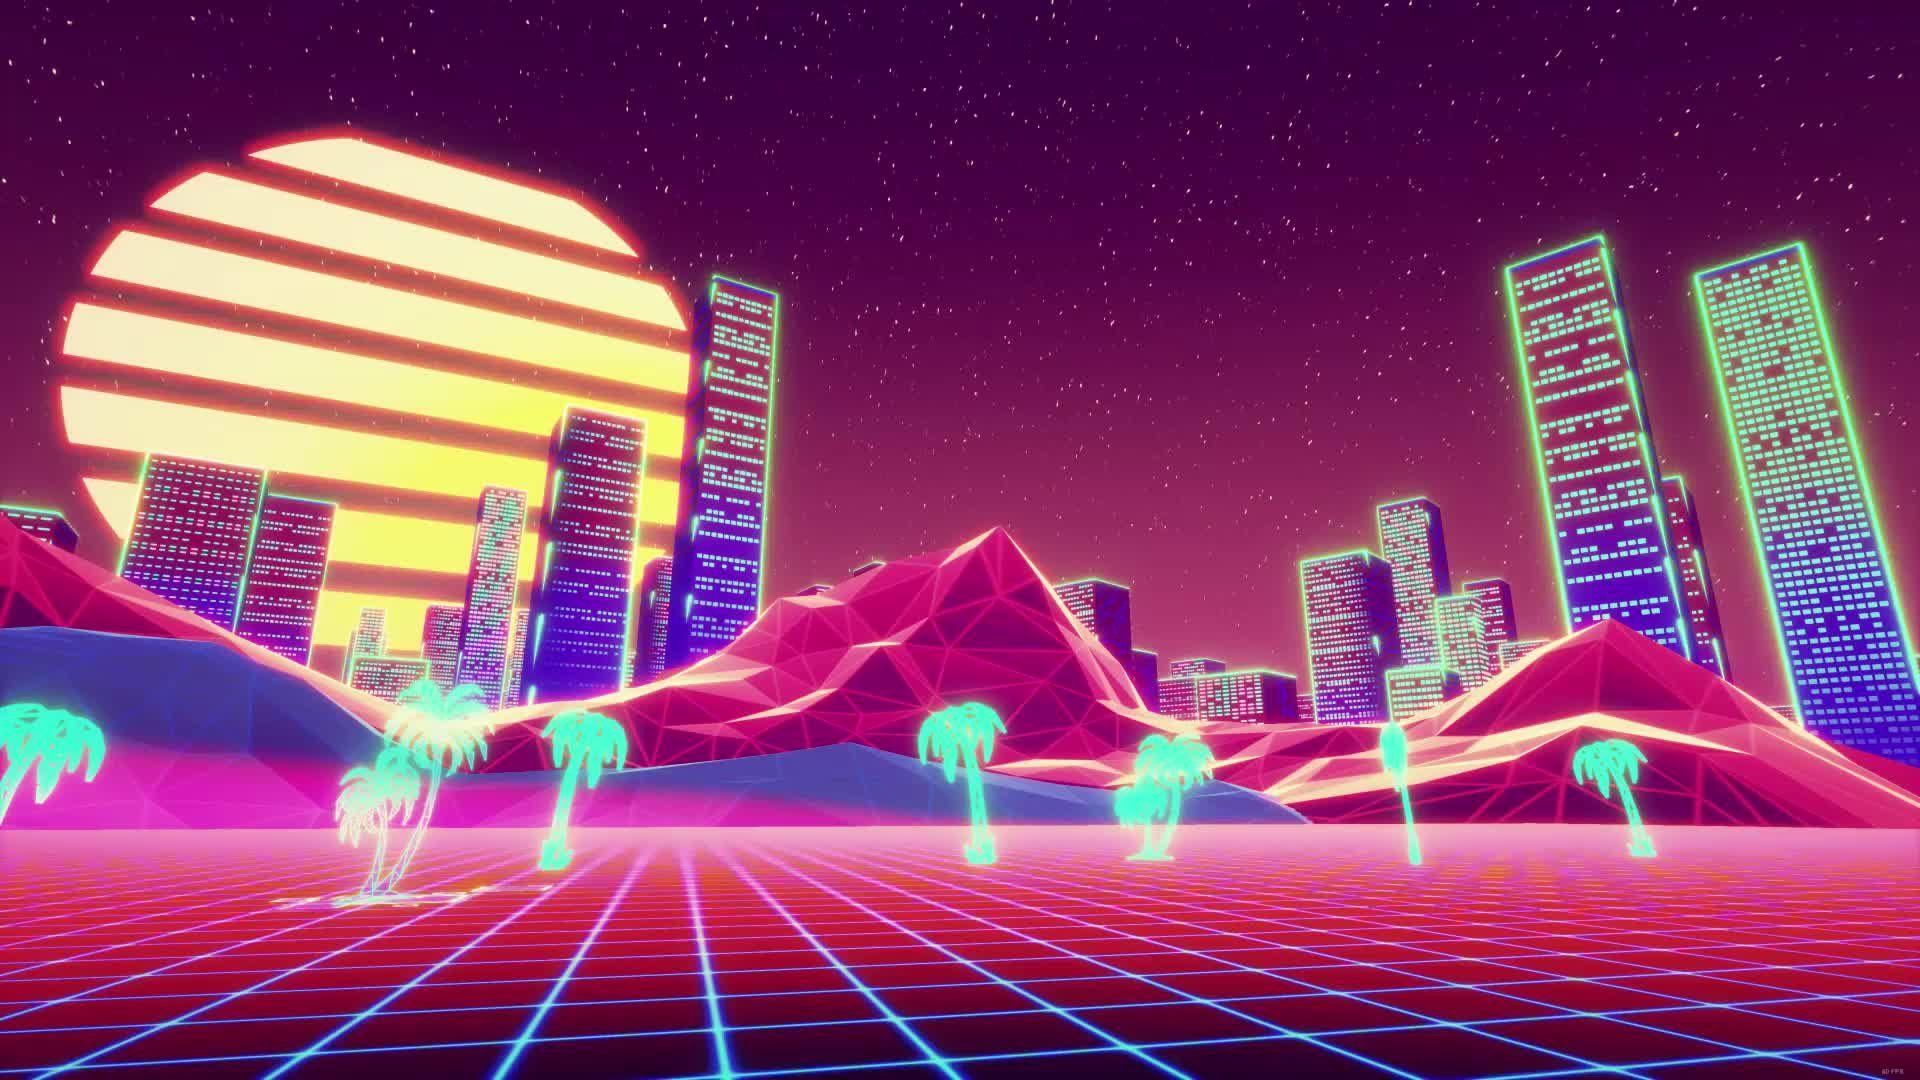 2k Retro City Neon Lights Live Wallpaper Live Wallpapers Free Animated Wallpaper Wallpaper